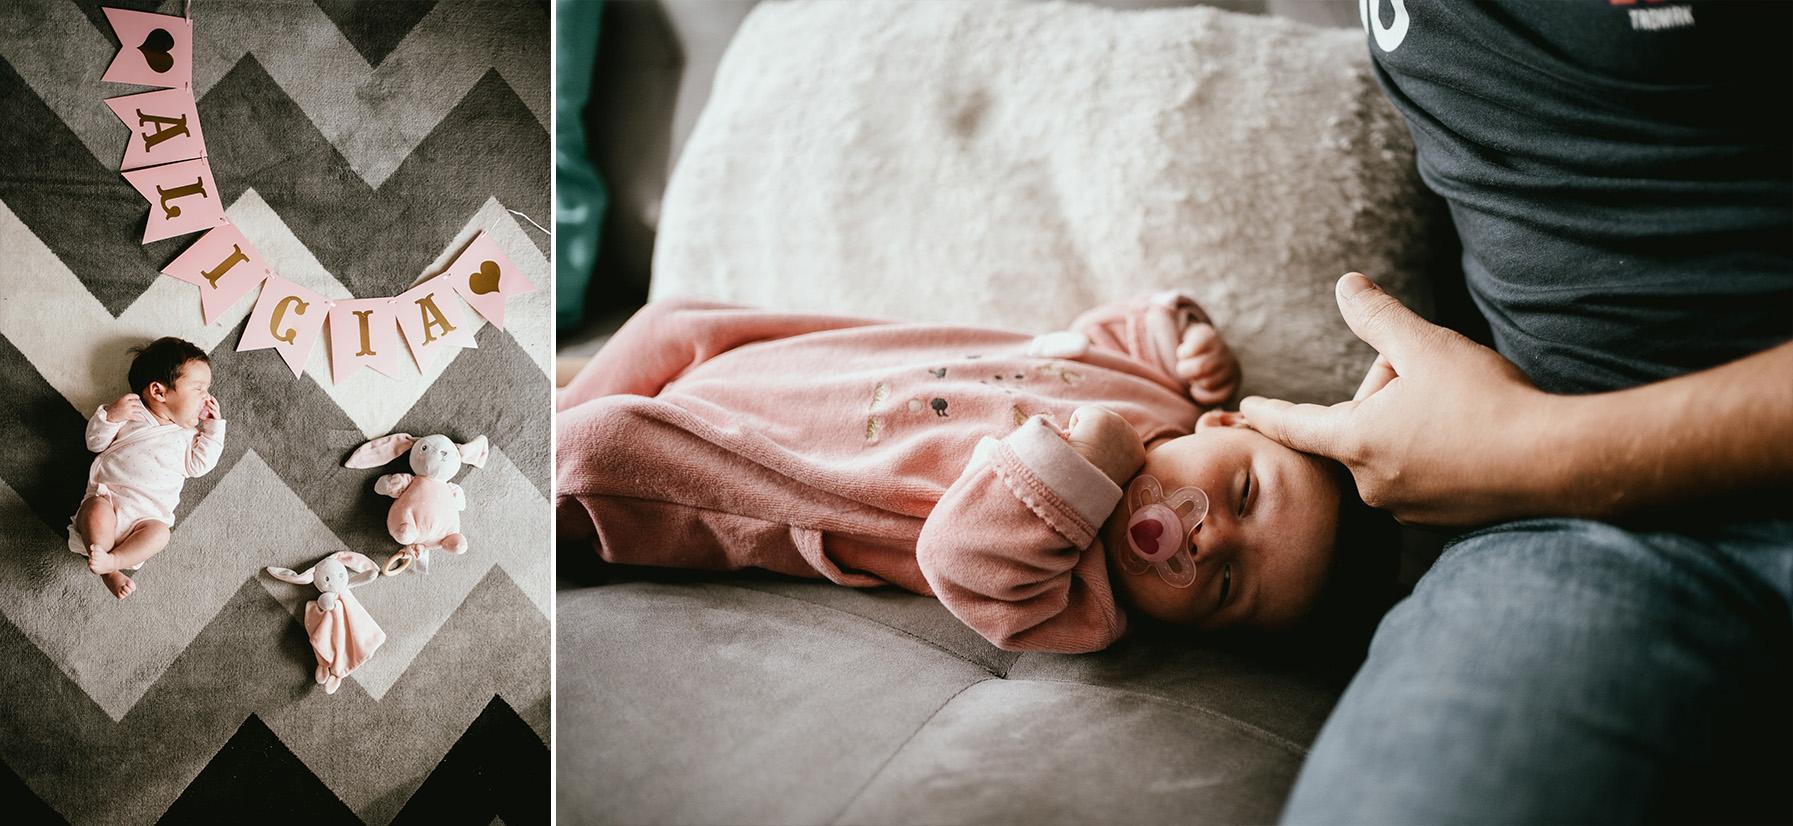 Photographe naissance dax famille maison lifestyle 2